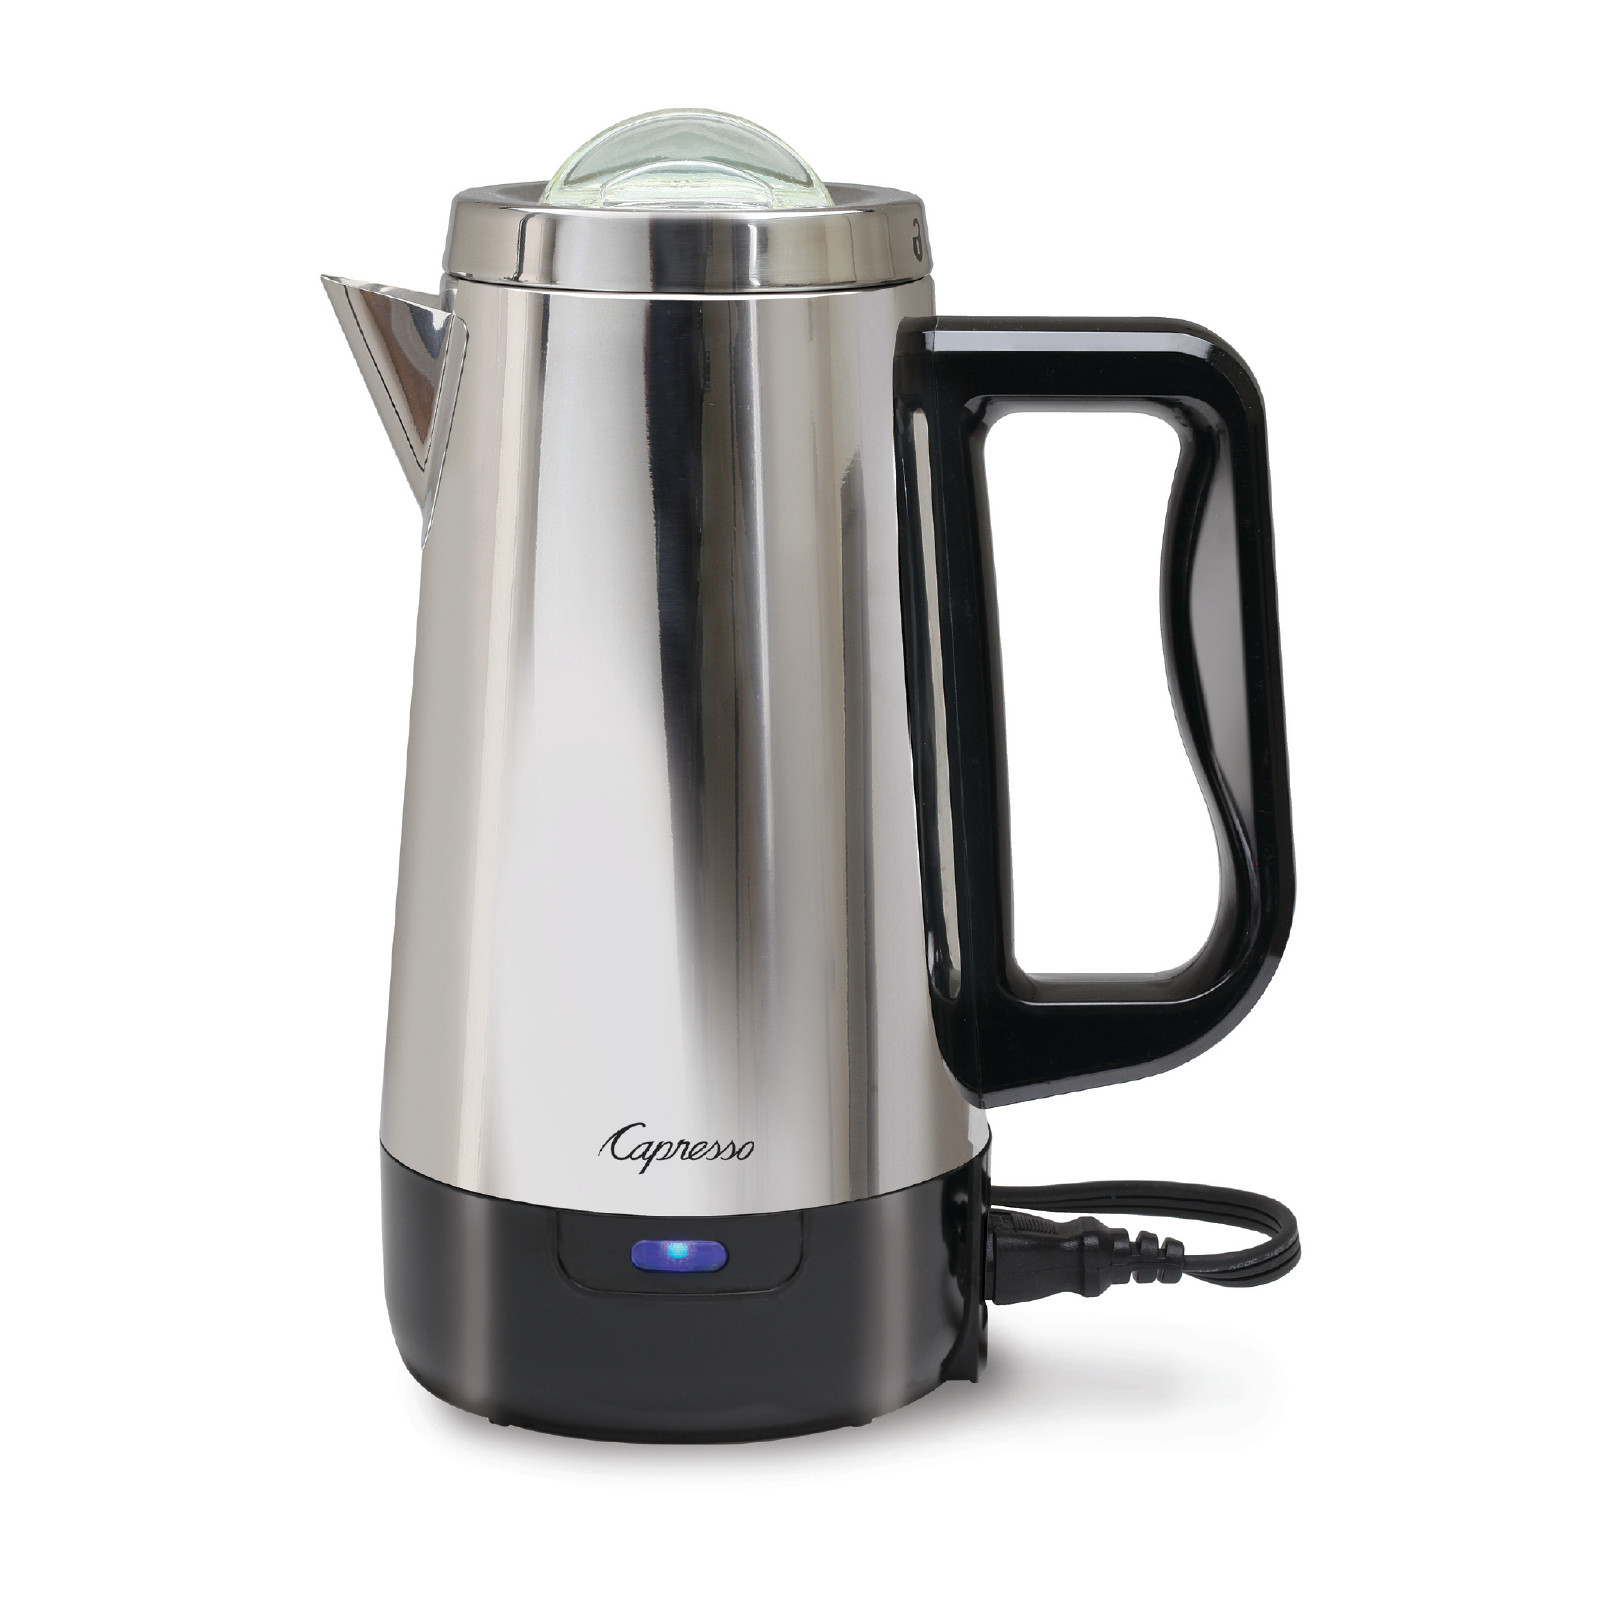 Capresso Perk Stainless Steel 8 Cup Electric Percolator